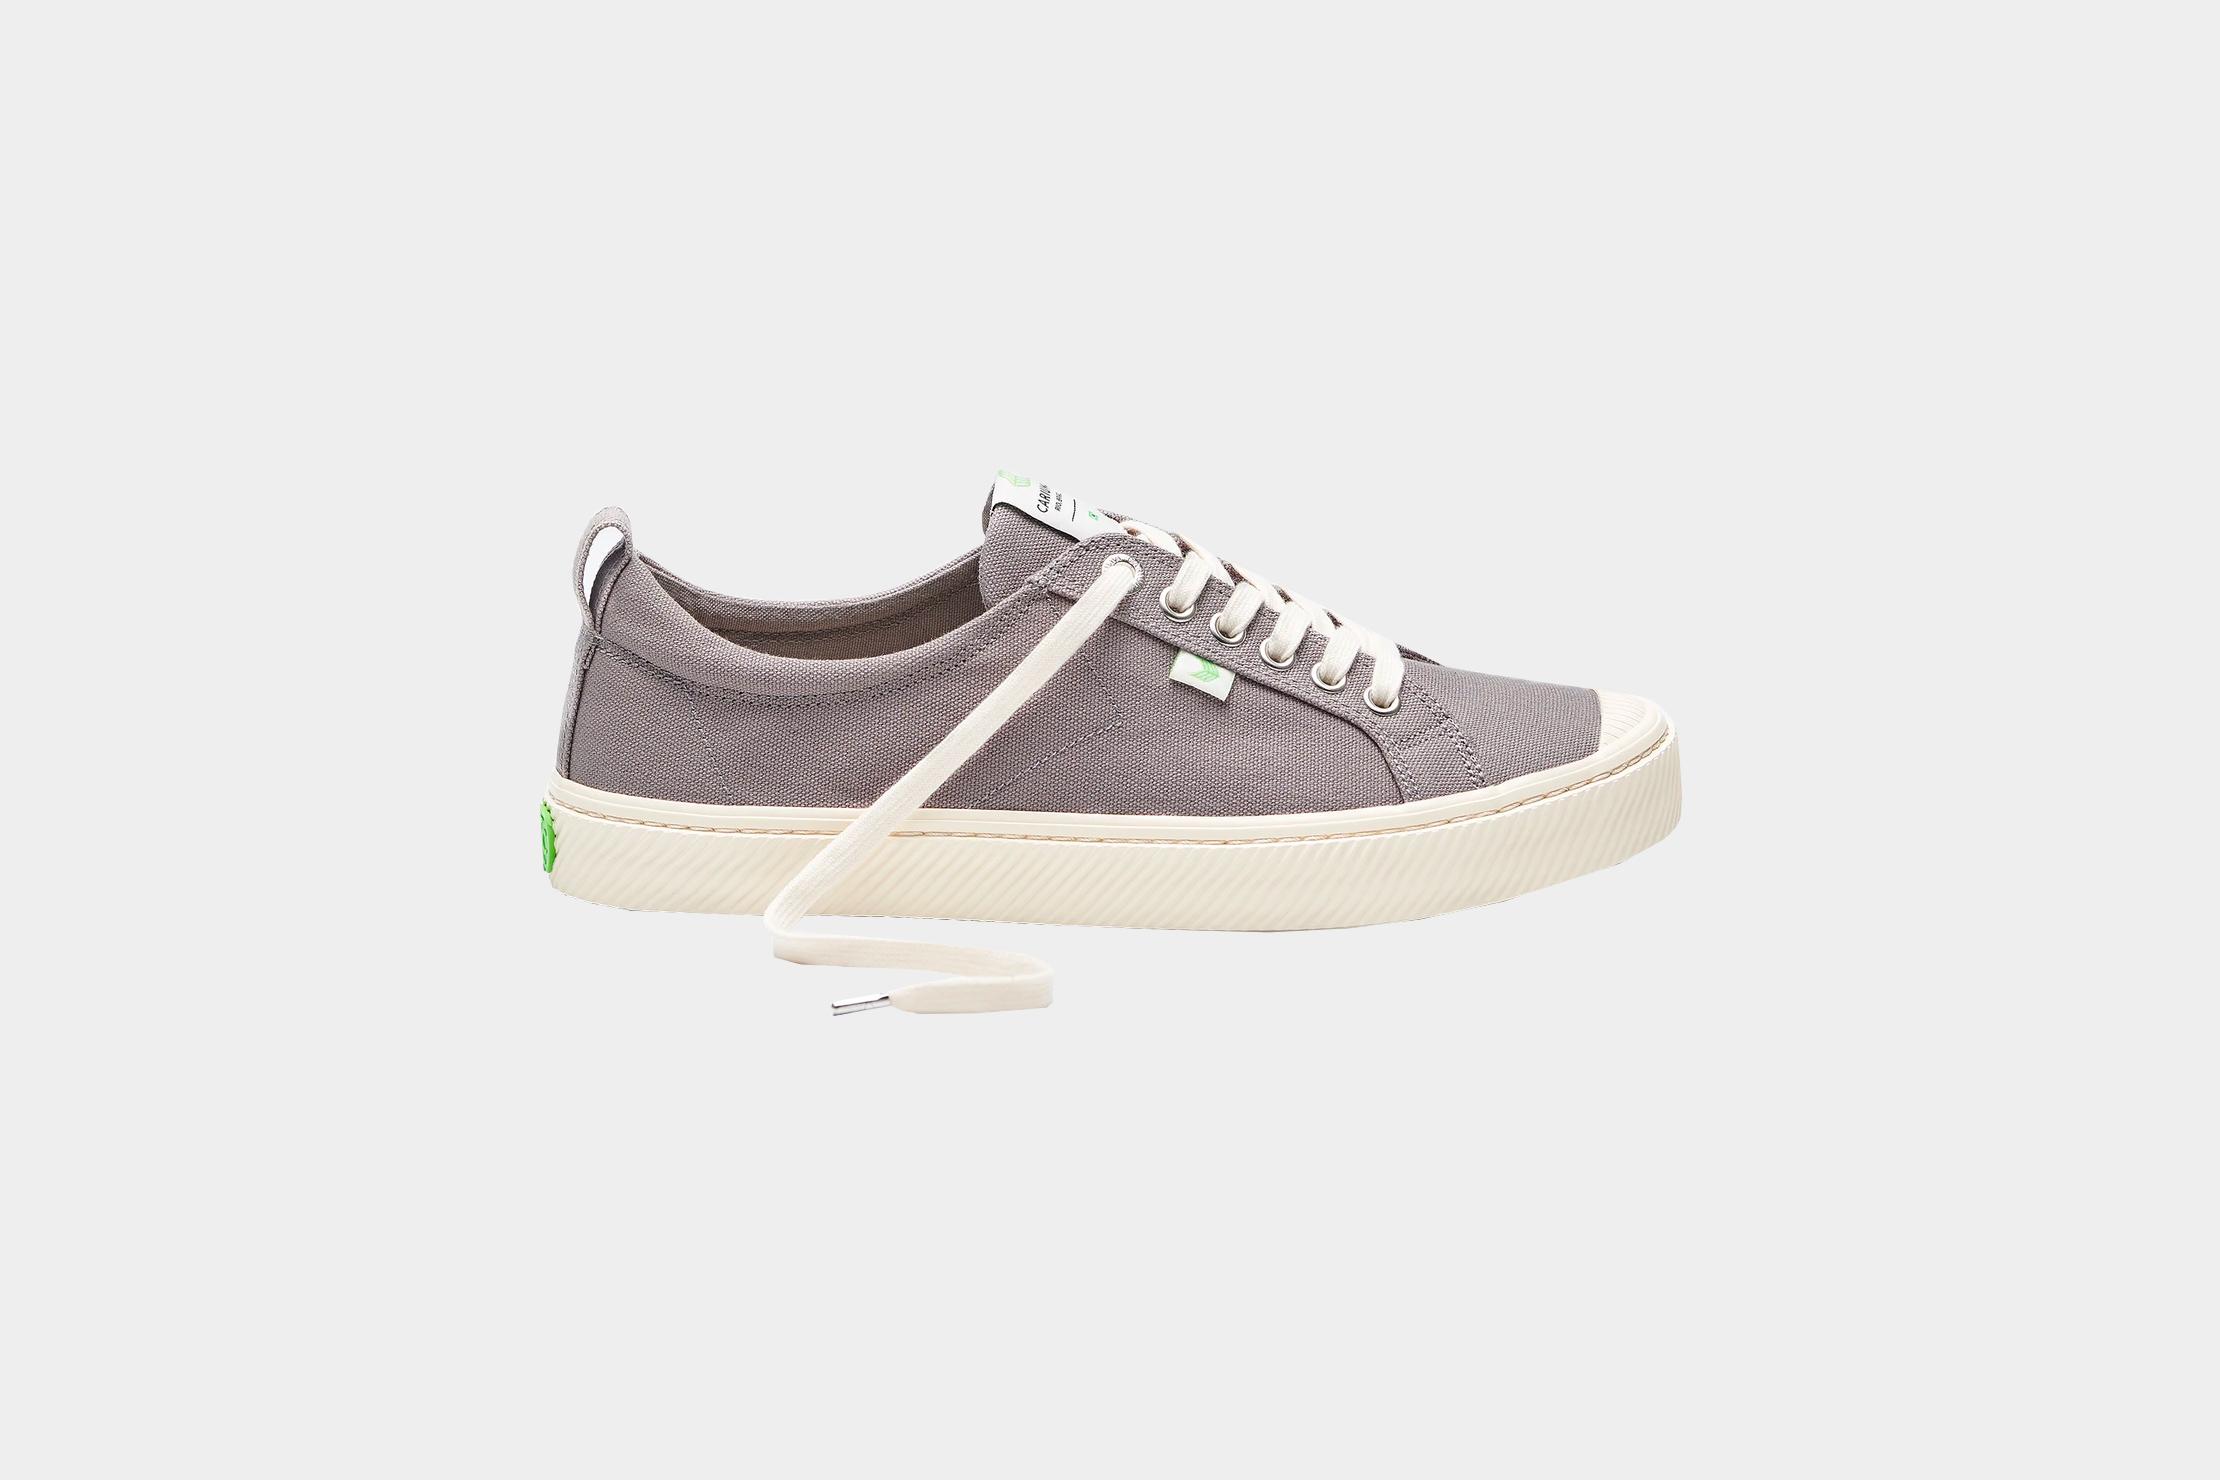 Cariuma OCA Low Shoes Review   Pack Hacker